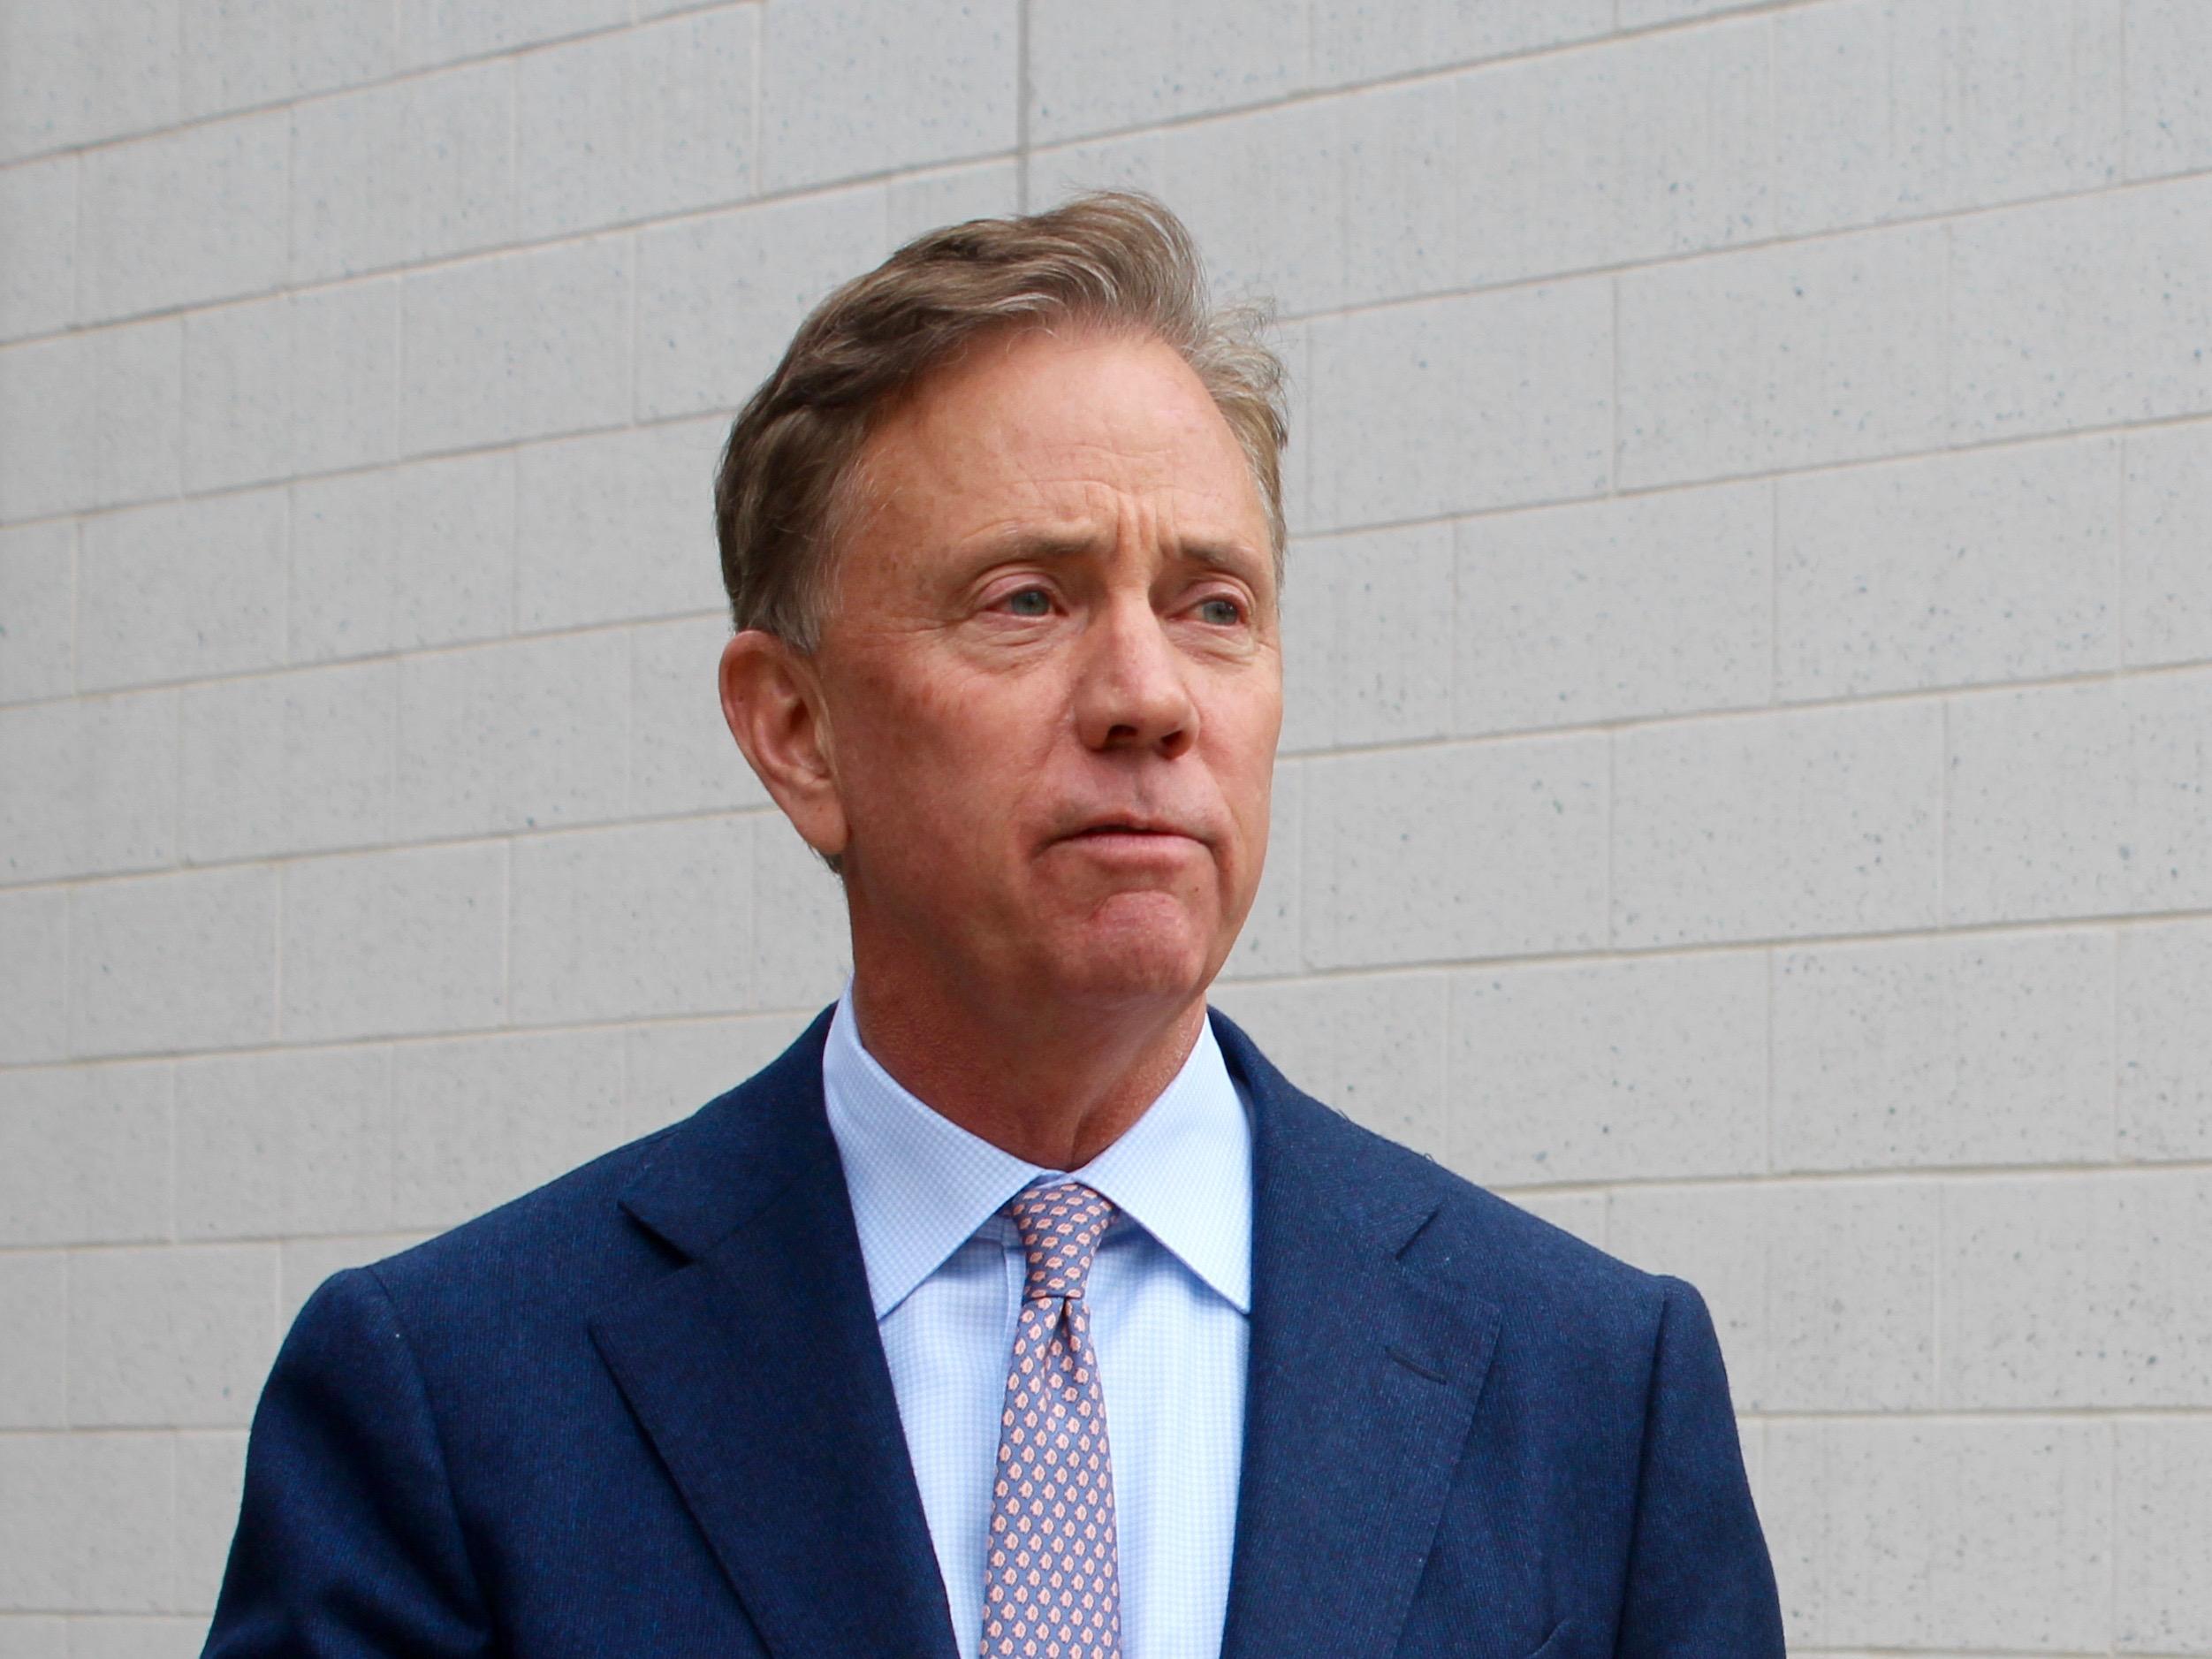 Lamont wants to slam brakes on state borrowing